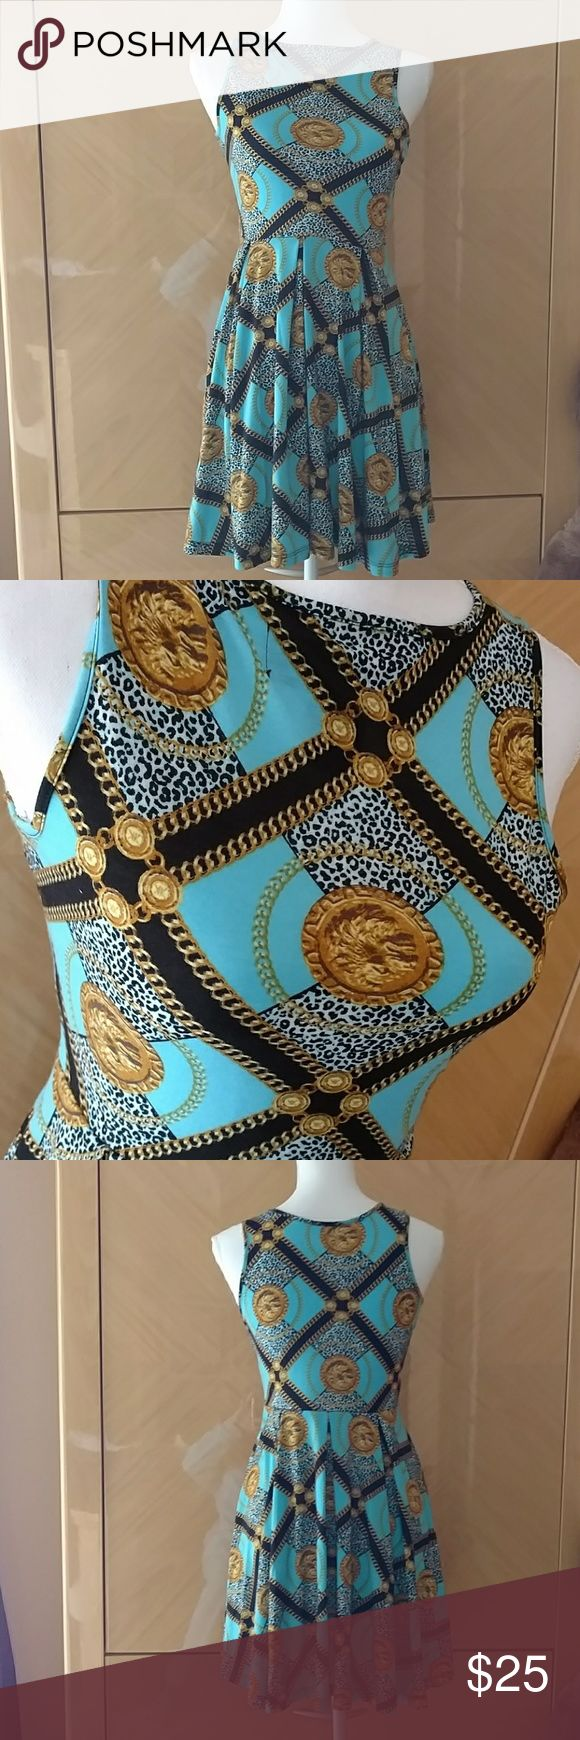 Kardashian Kollection coin dress XS Kardashian Kollection turquoise dress with gold coin designs. Stretchy. Size XS Kardashian Kollection Dresses Mini